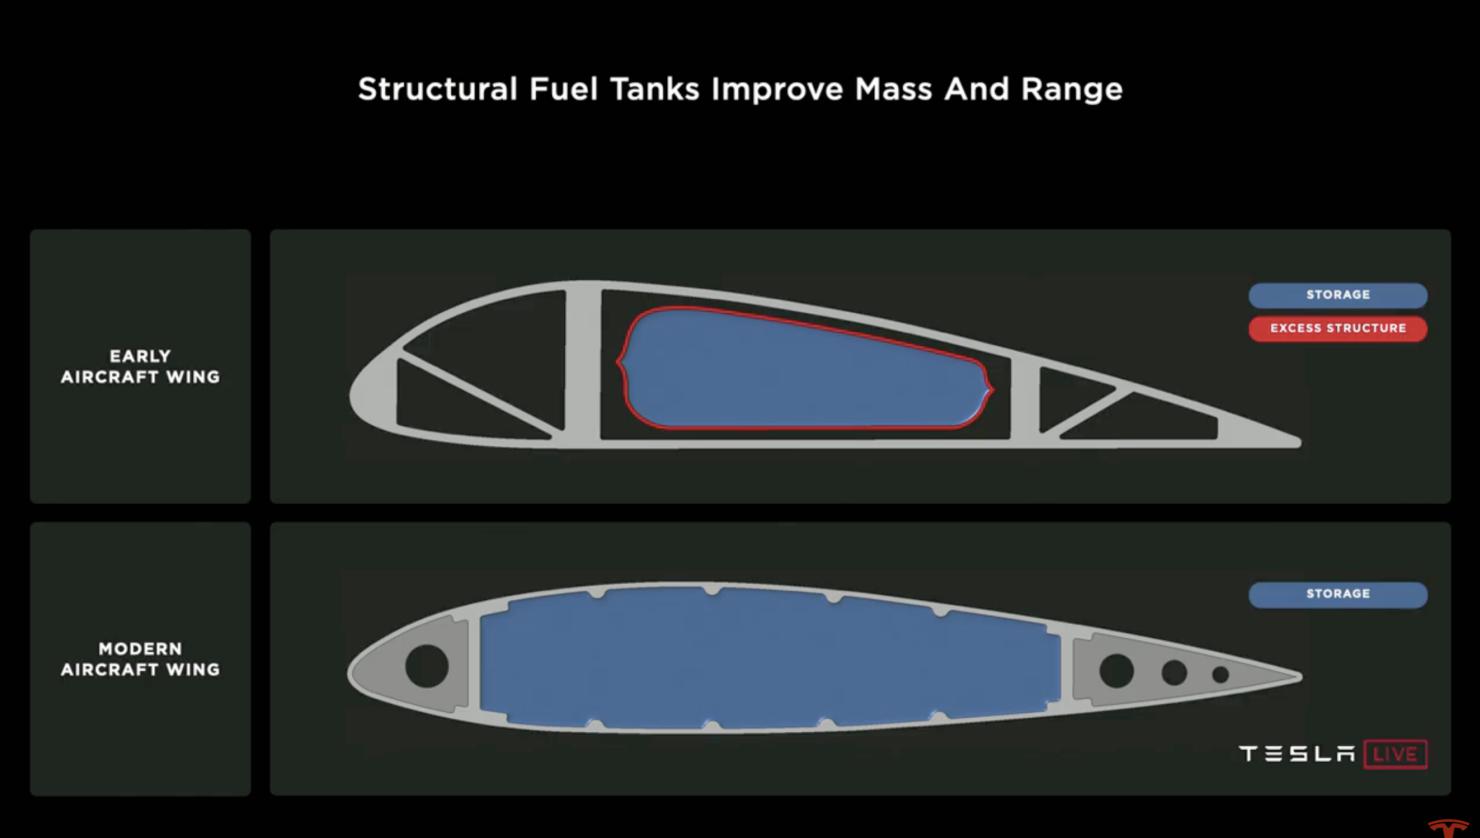 Tesla Battery Day 2020 battery design